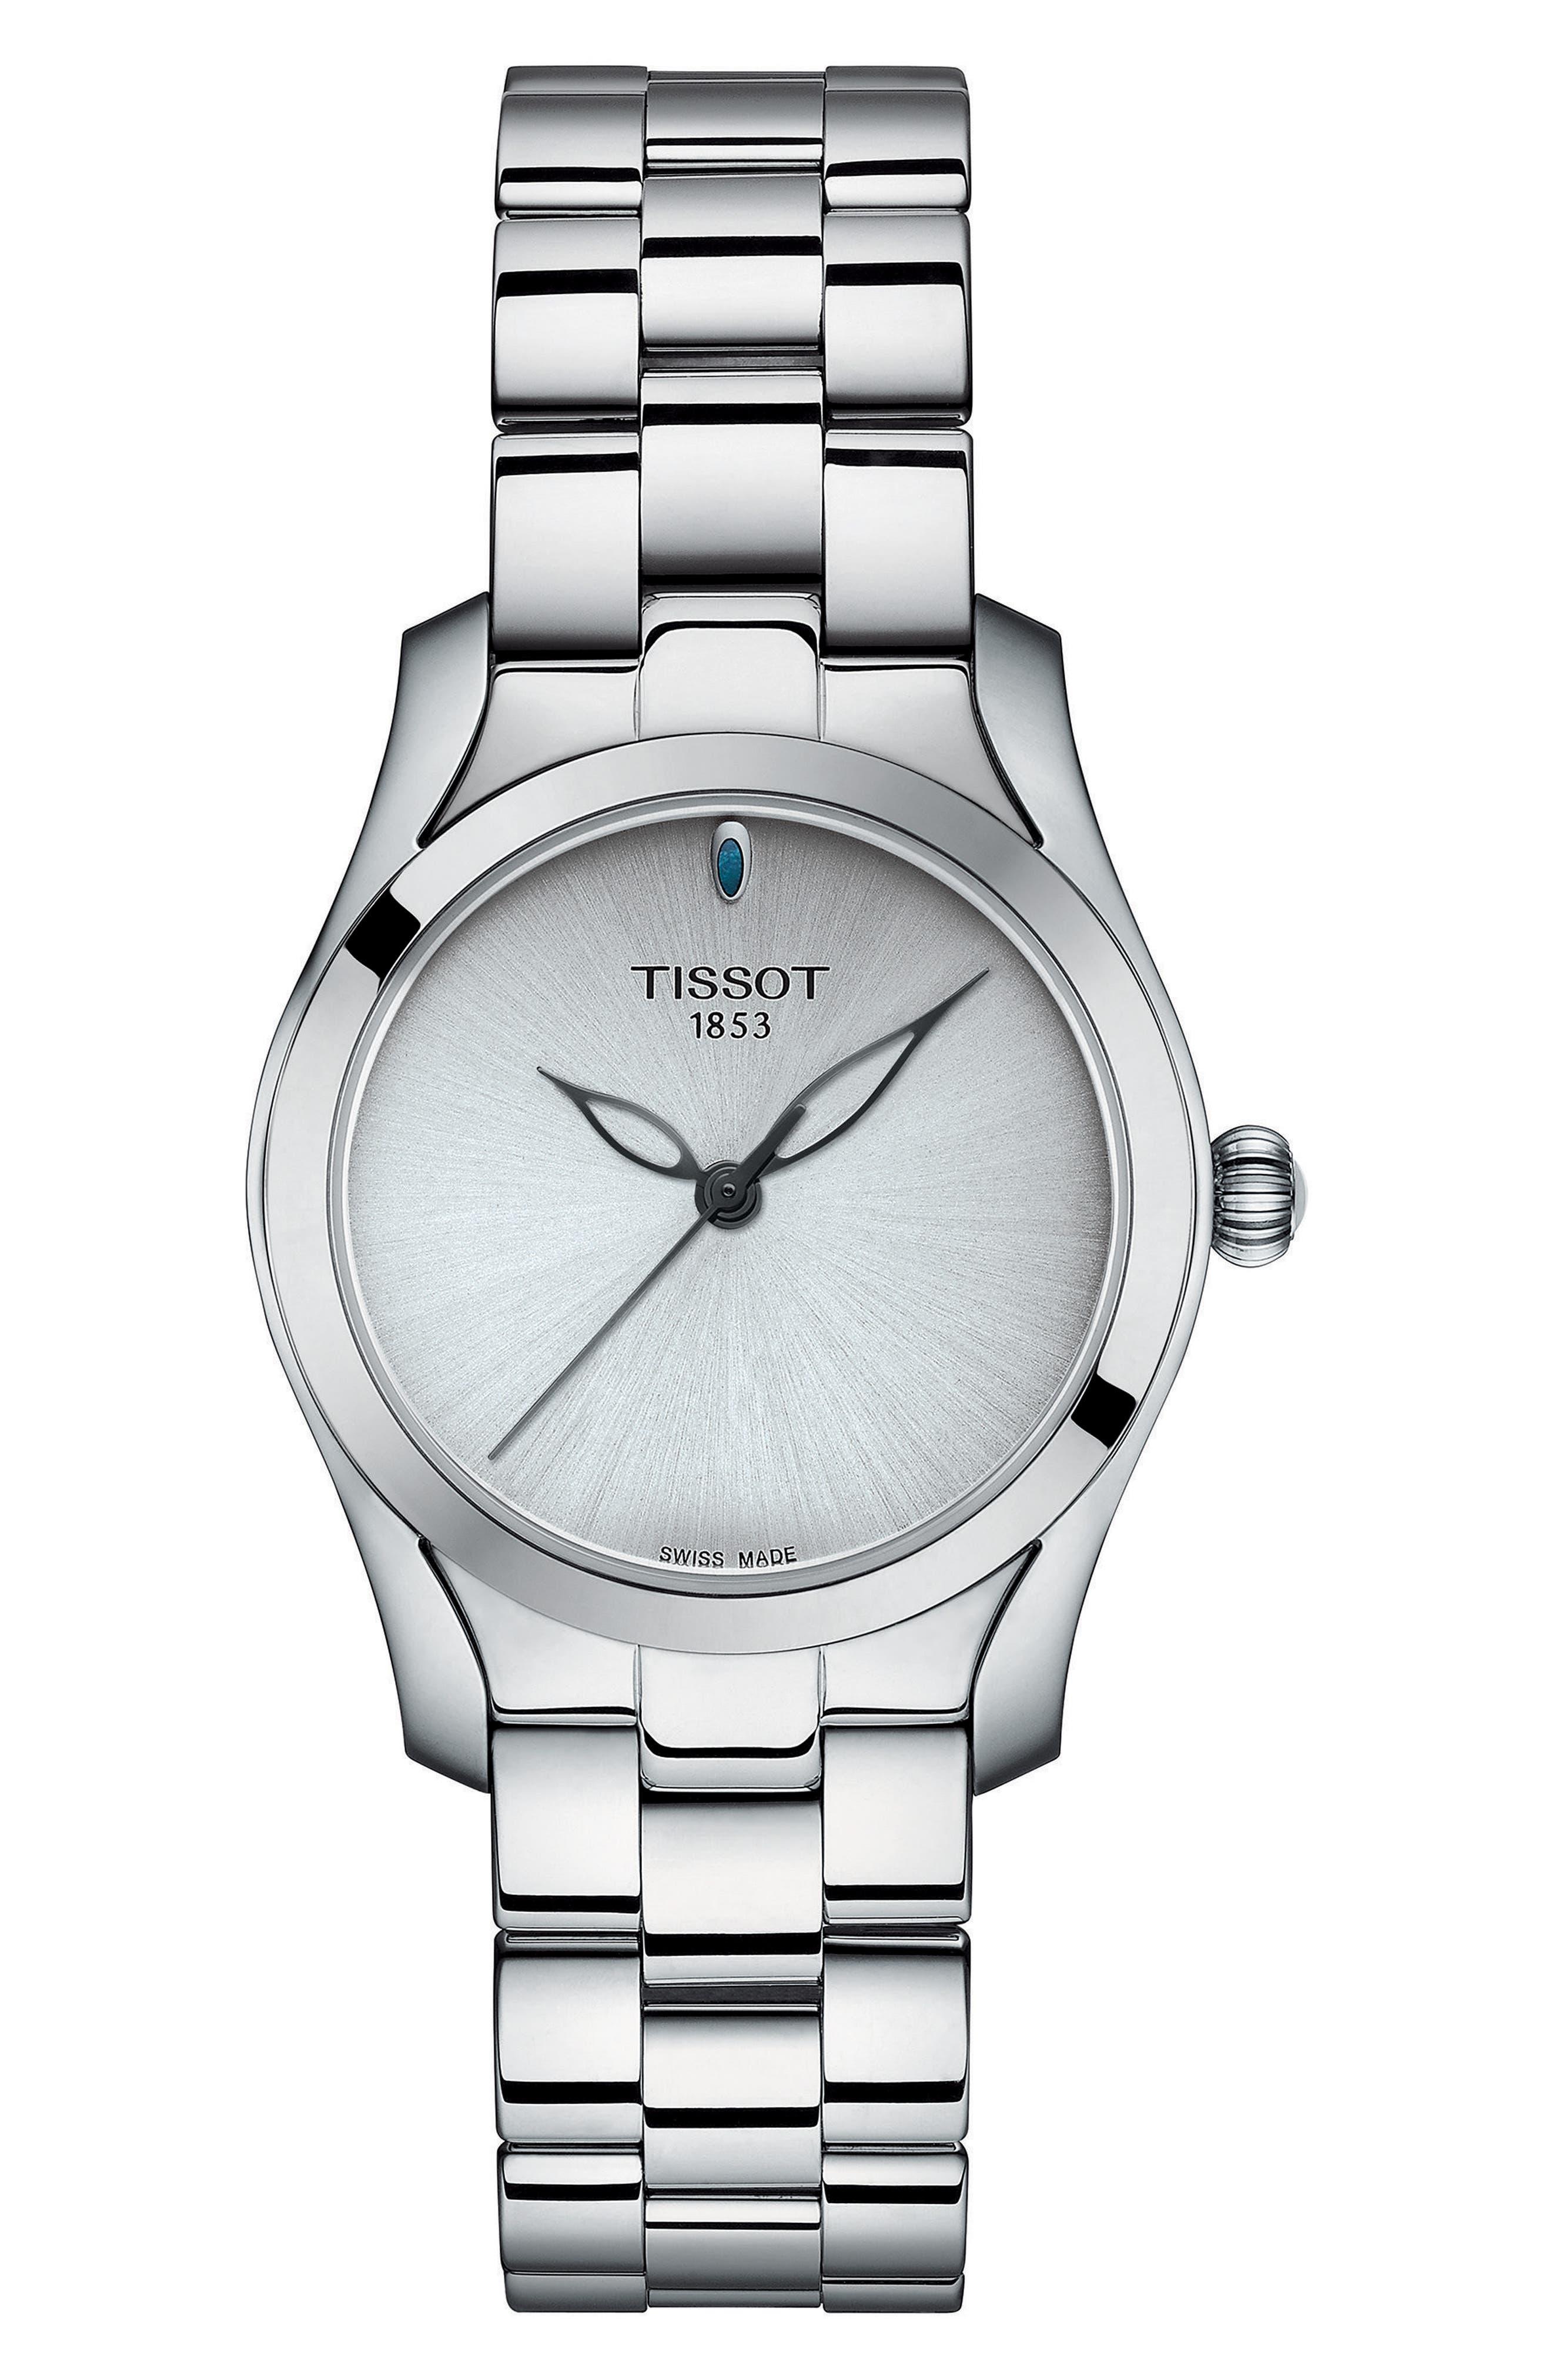 Main Image - Tissot T-Wave Bracelet Watch, 30mm